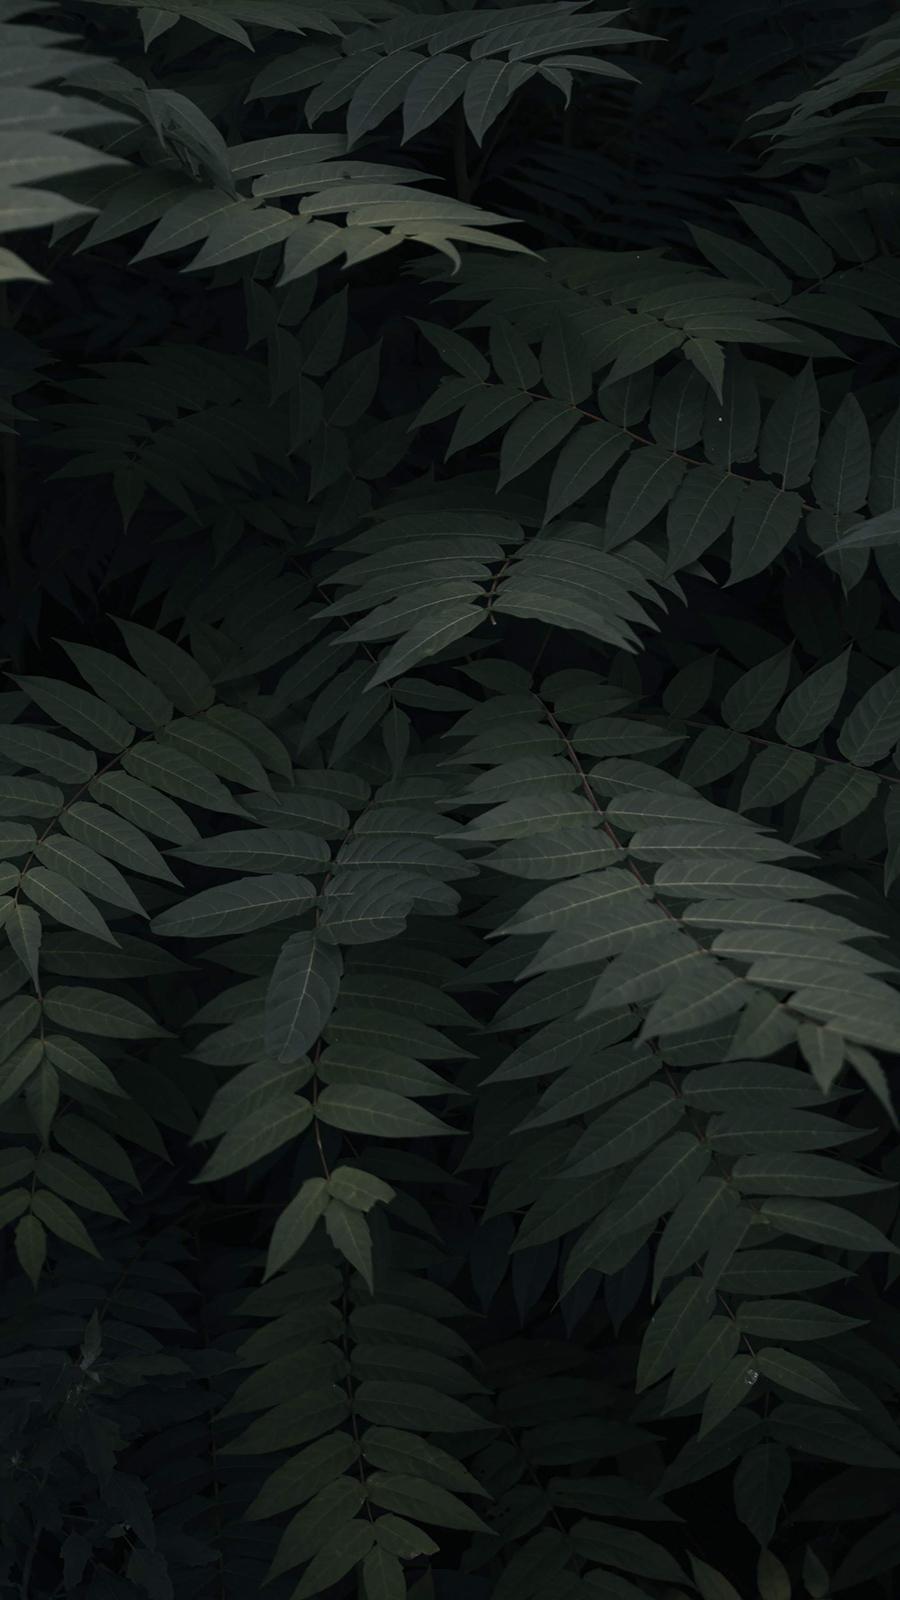 Leaf Background Wallpapers